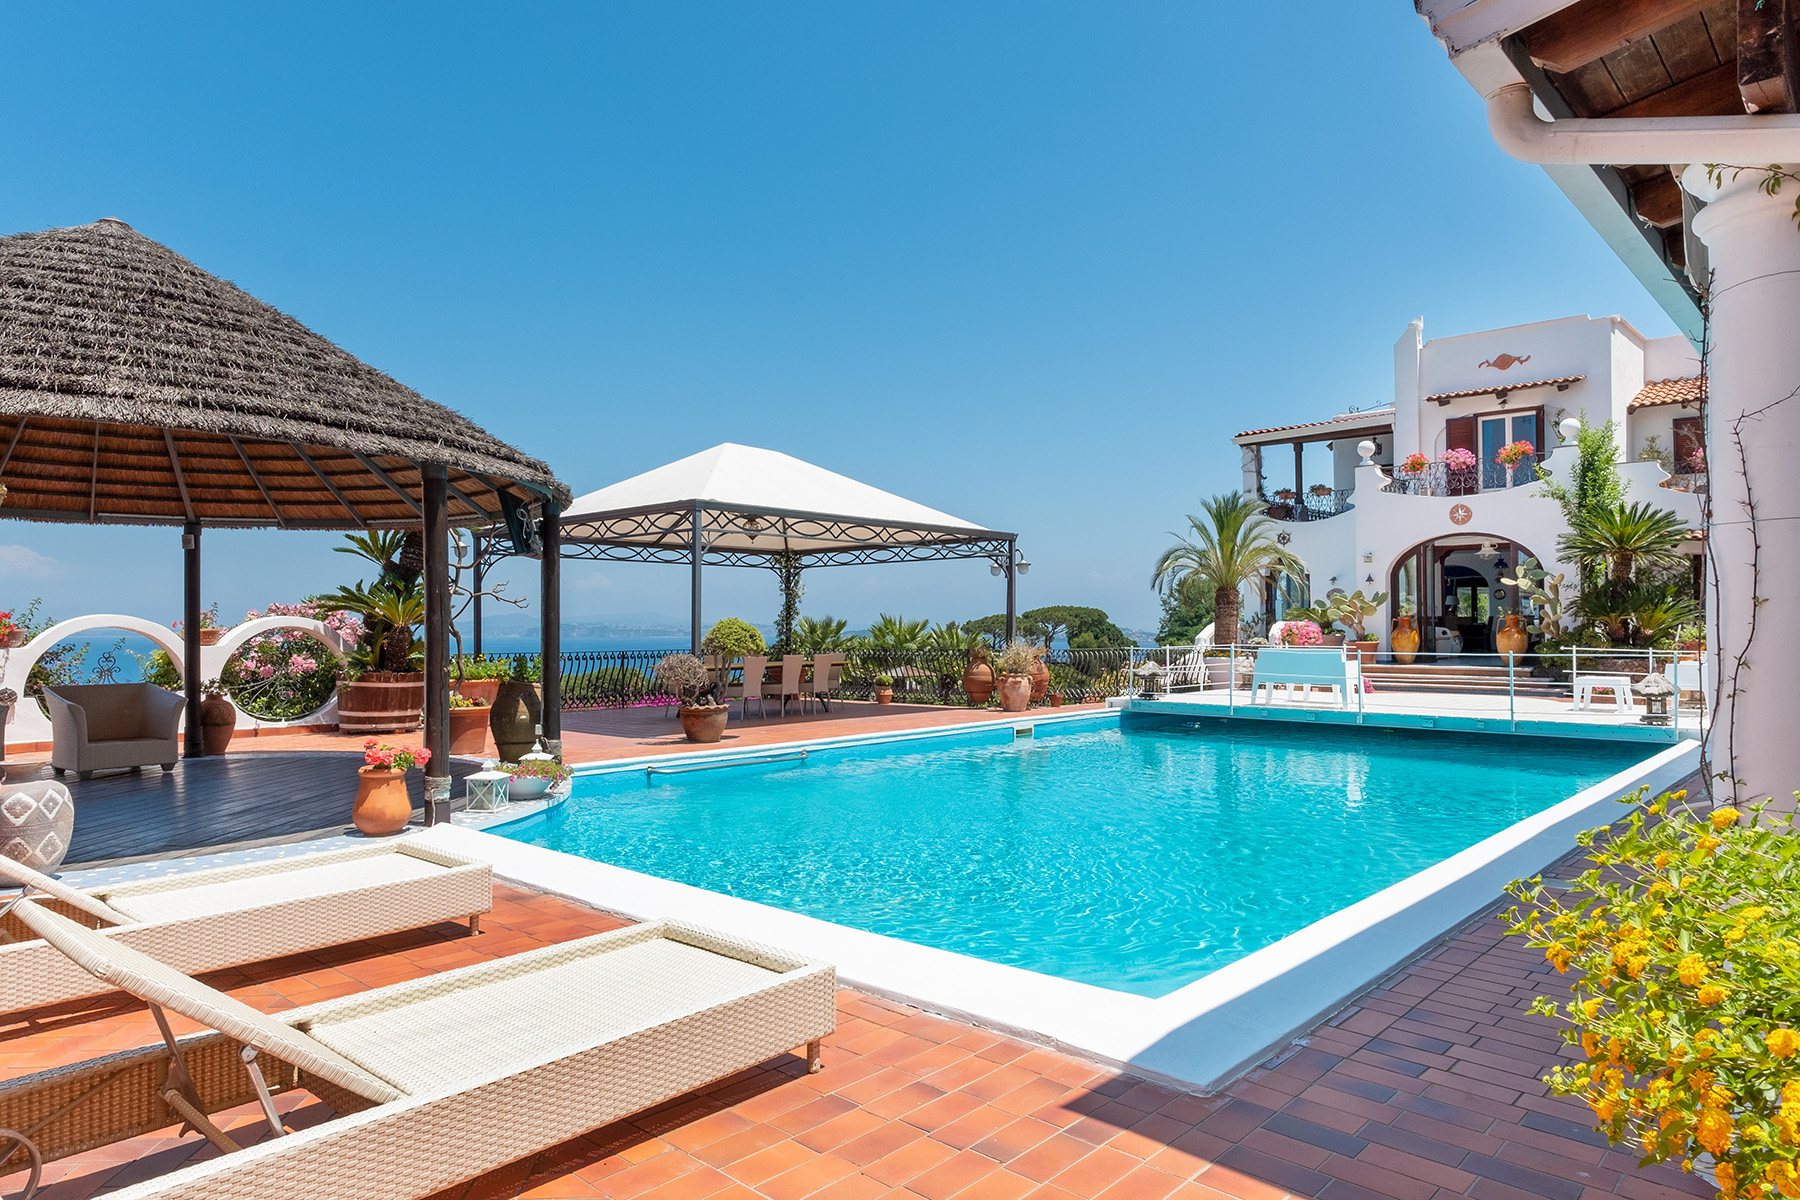 Villa in Vendita a Ischia: 5 locali, 500 mq - Foto 13